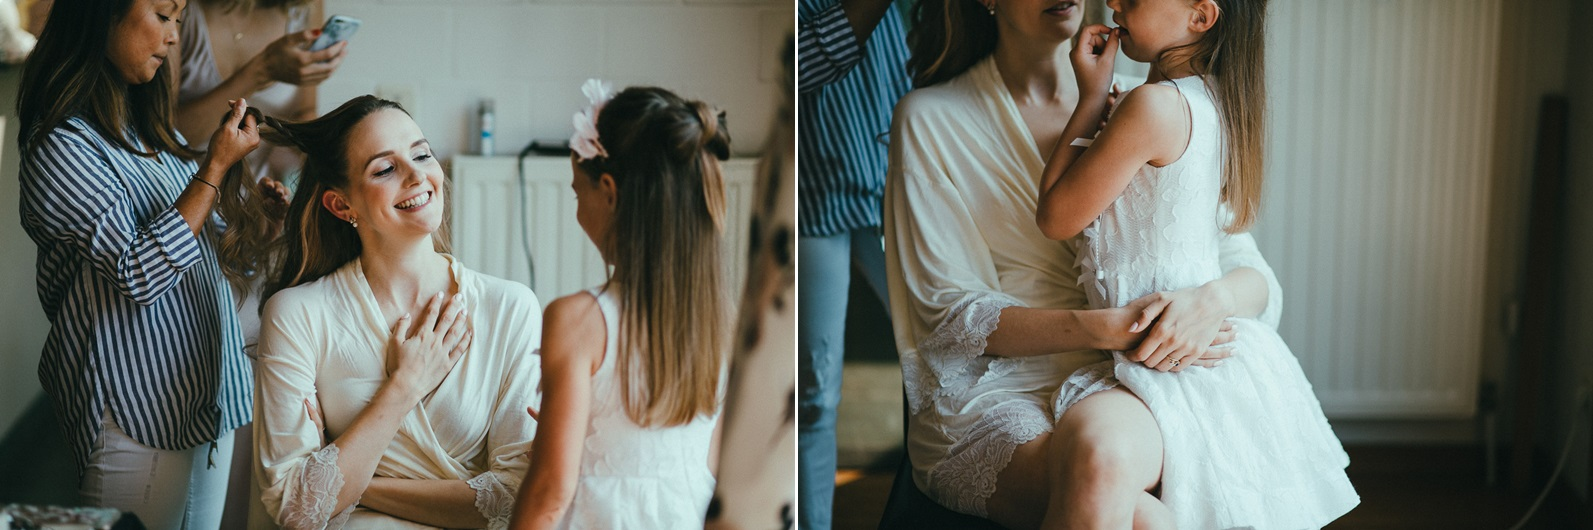 chateau-wedding-photography (20).jpg